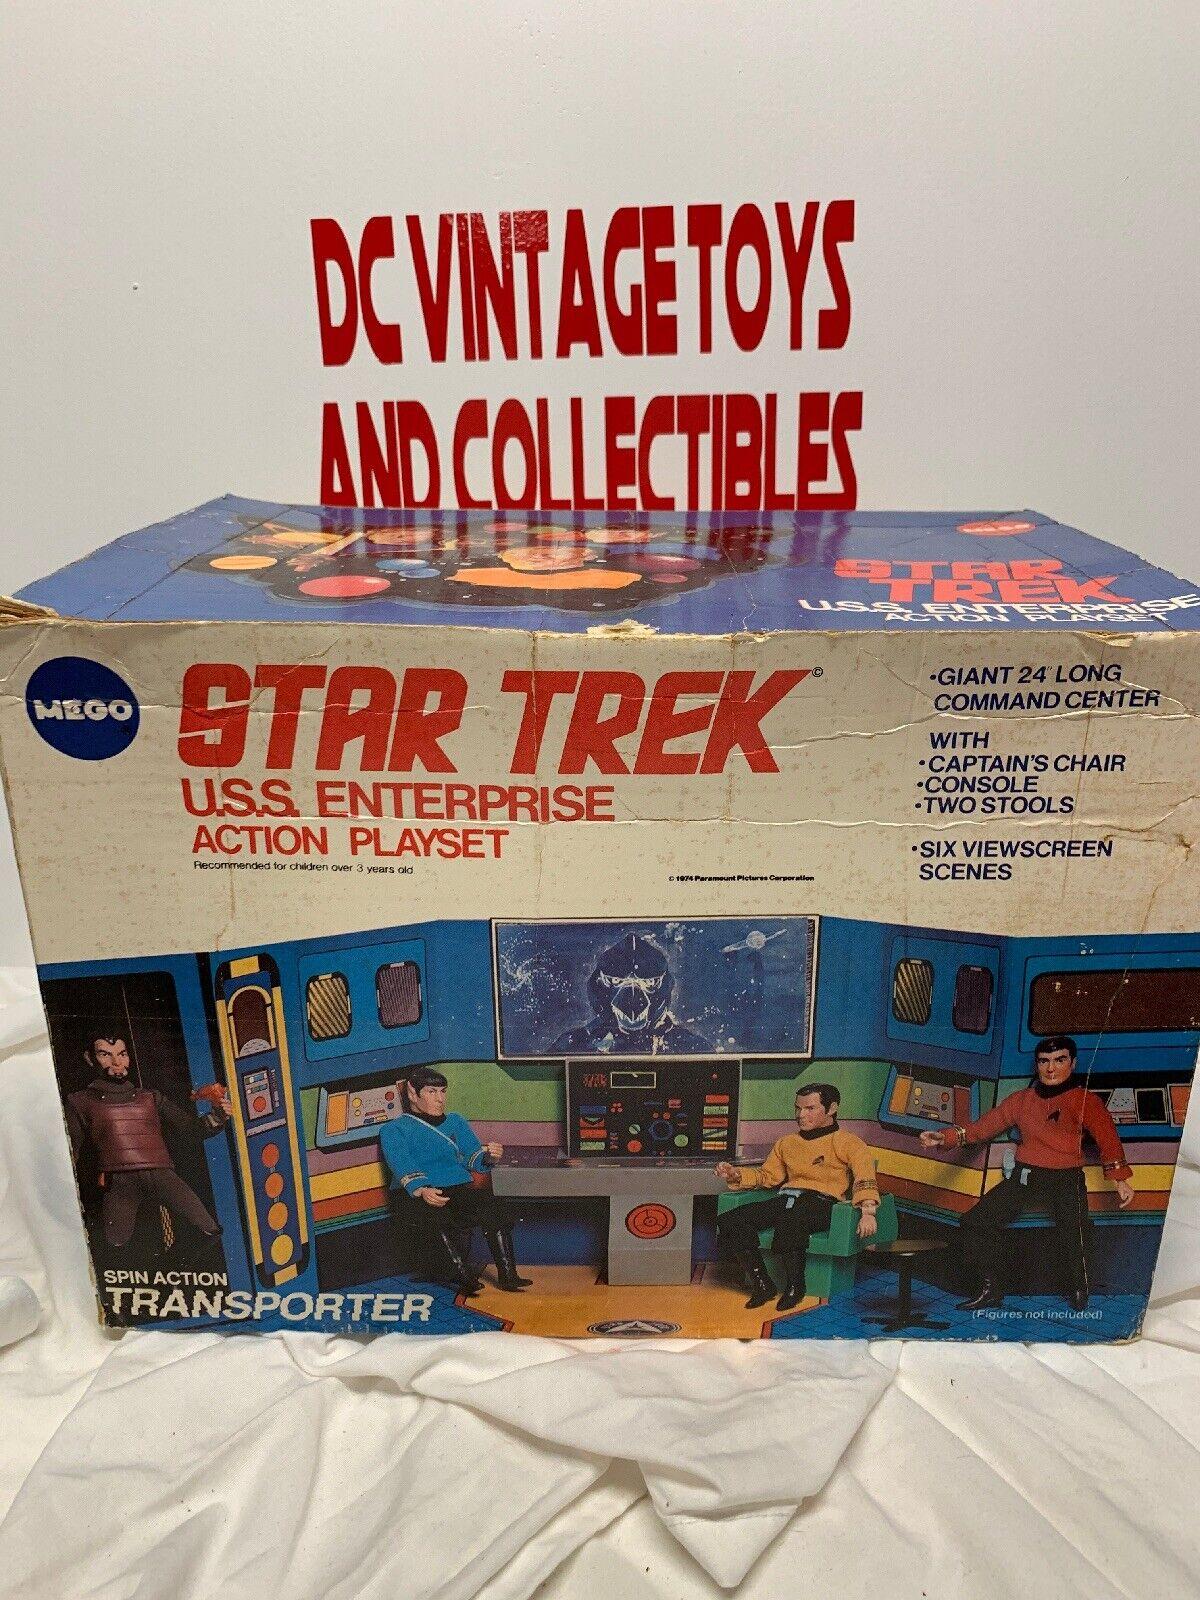 Mego 1975 Star Trek USS Enterprise Action Playset NOT Complete w Box